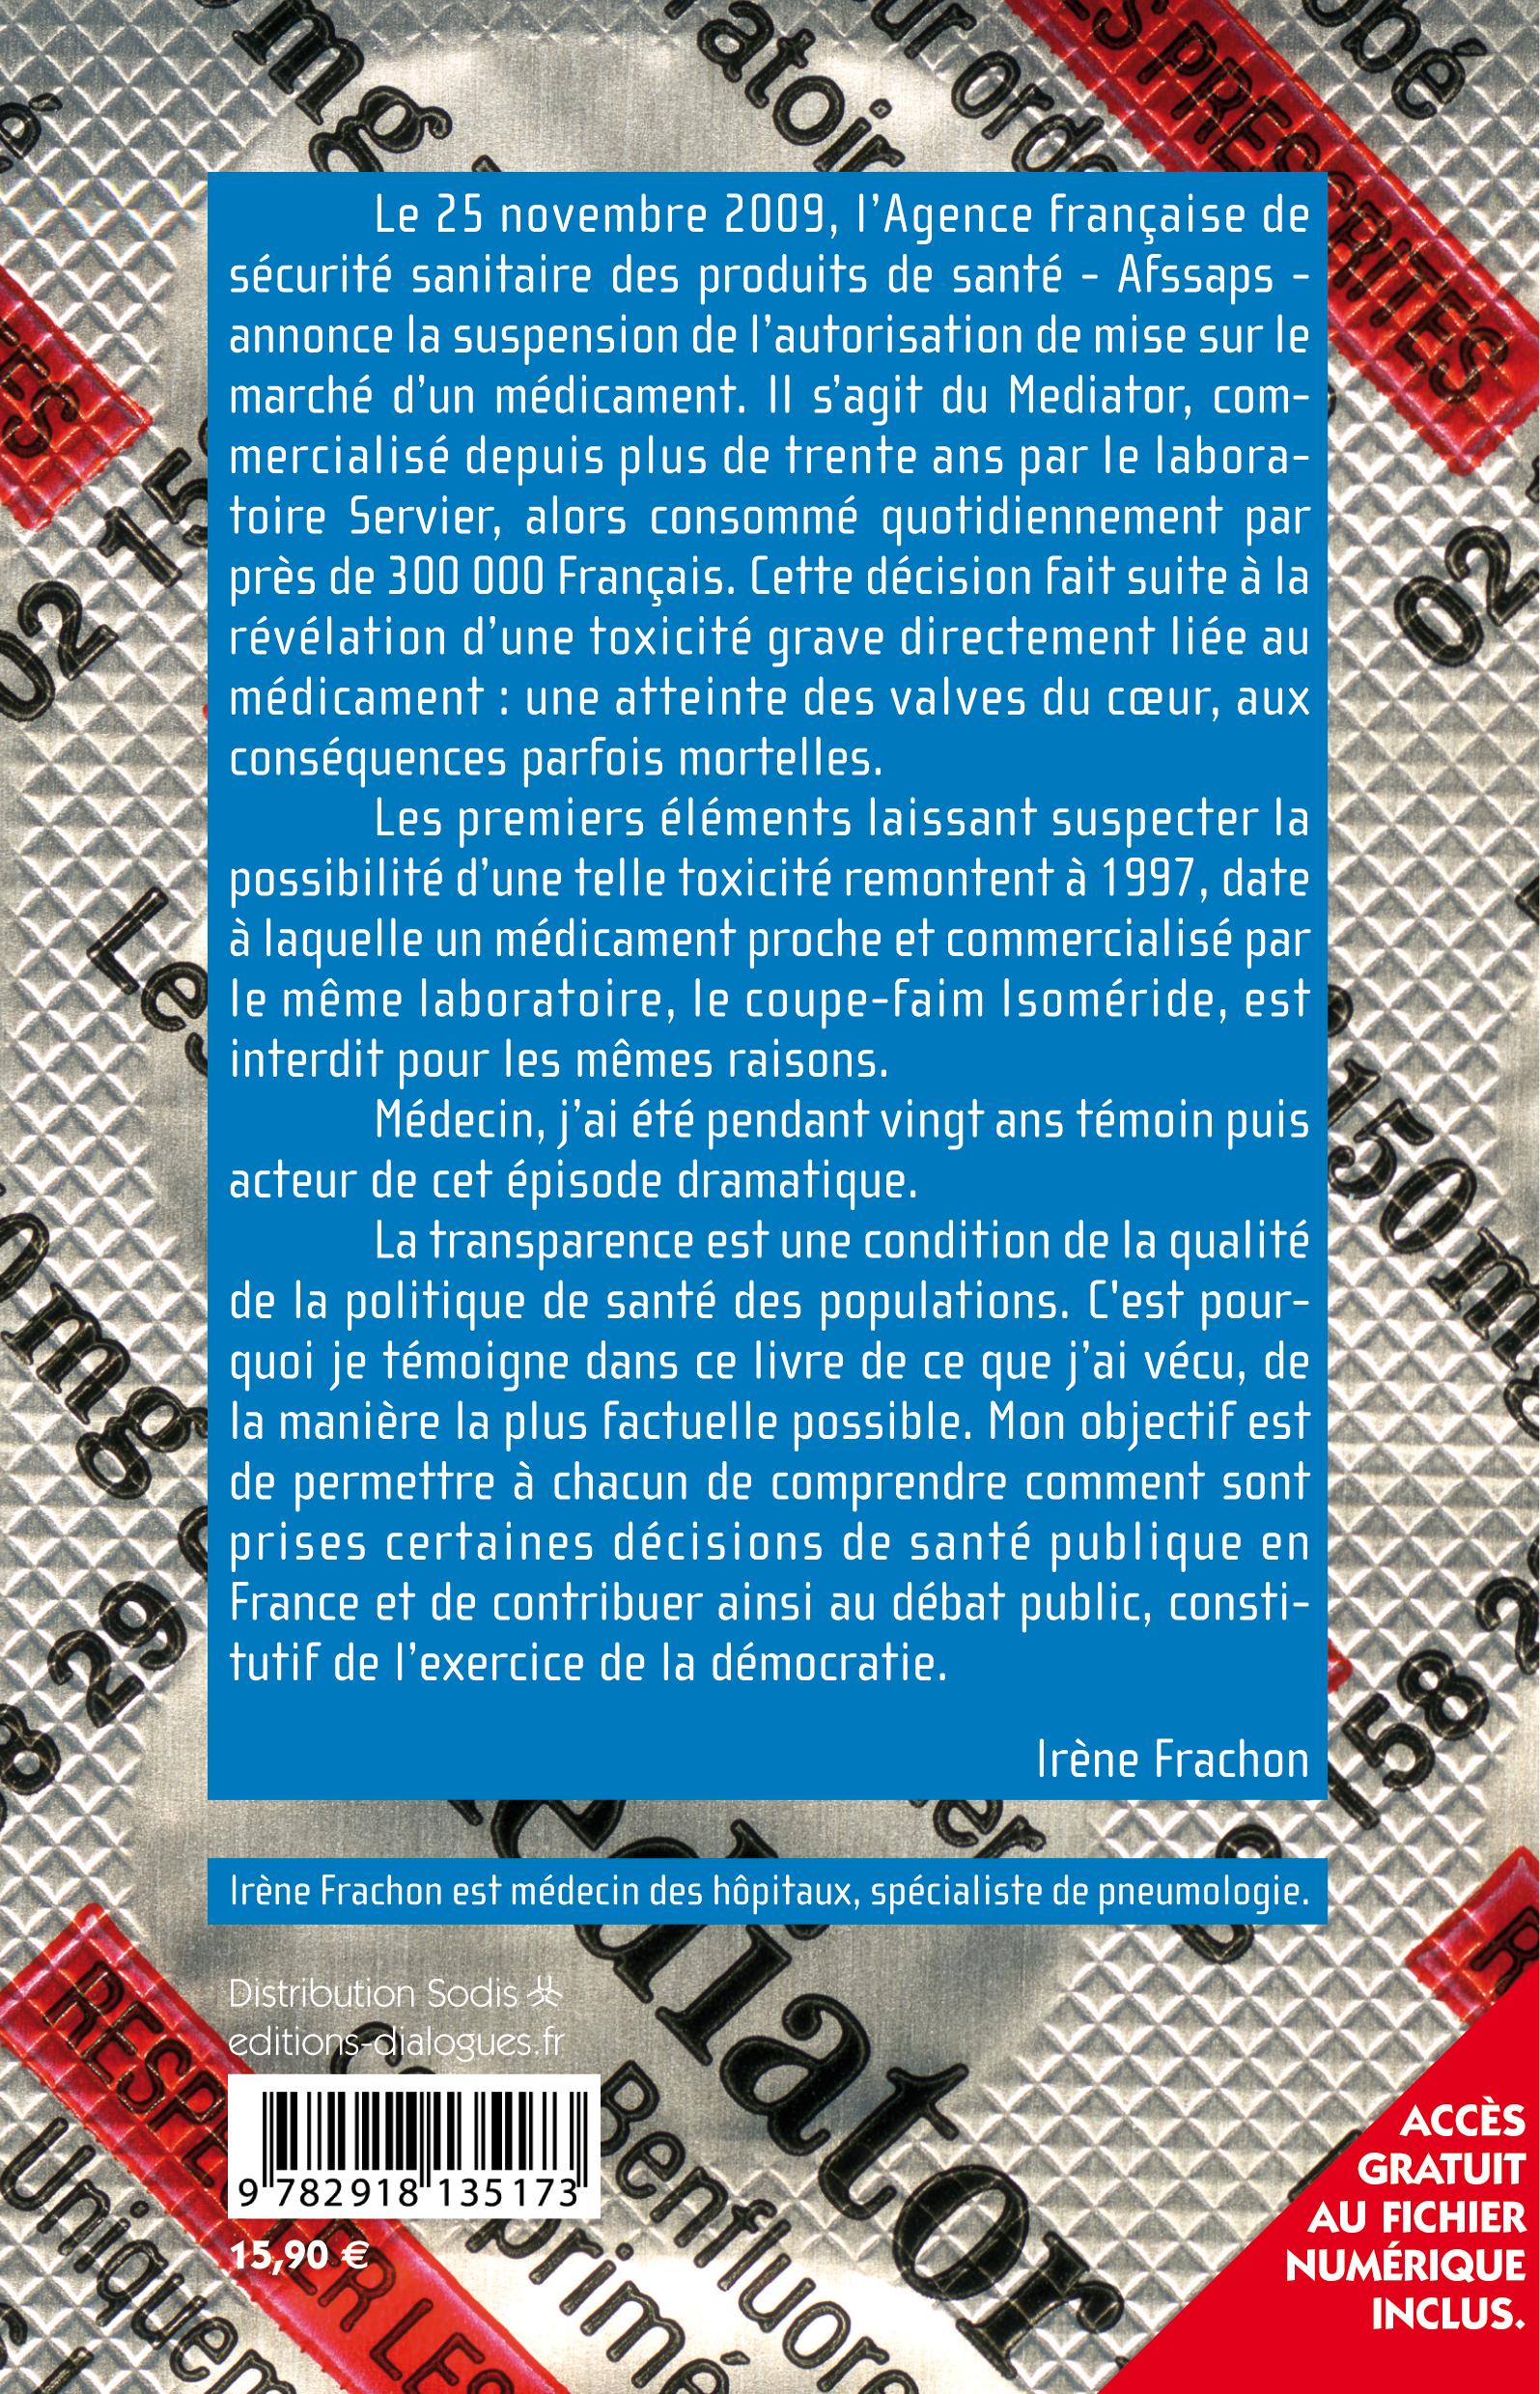 Ditions dialogues ir ne frachon mediator 150 mg combien de morts - Medicament coupe faim en pharmacie ...